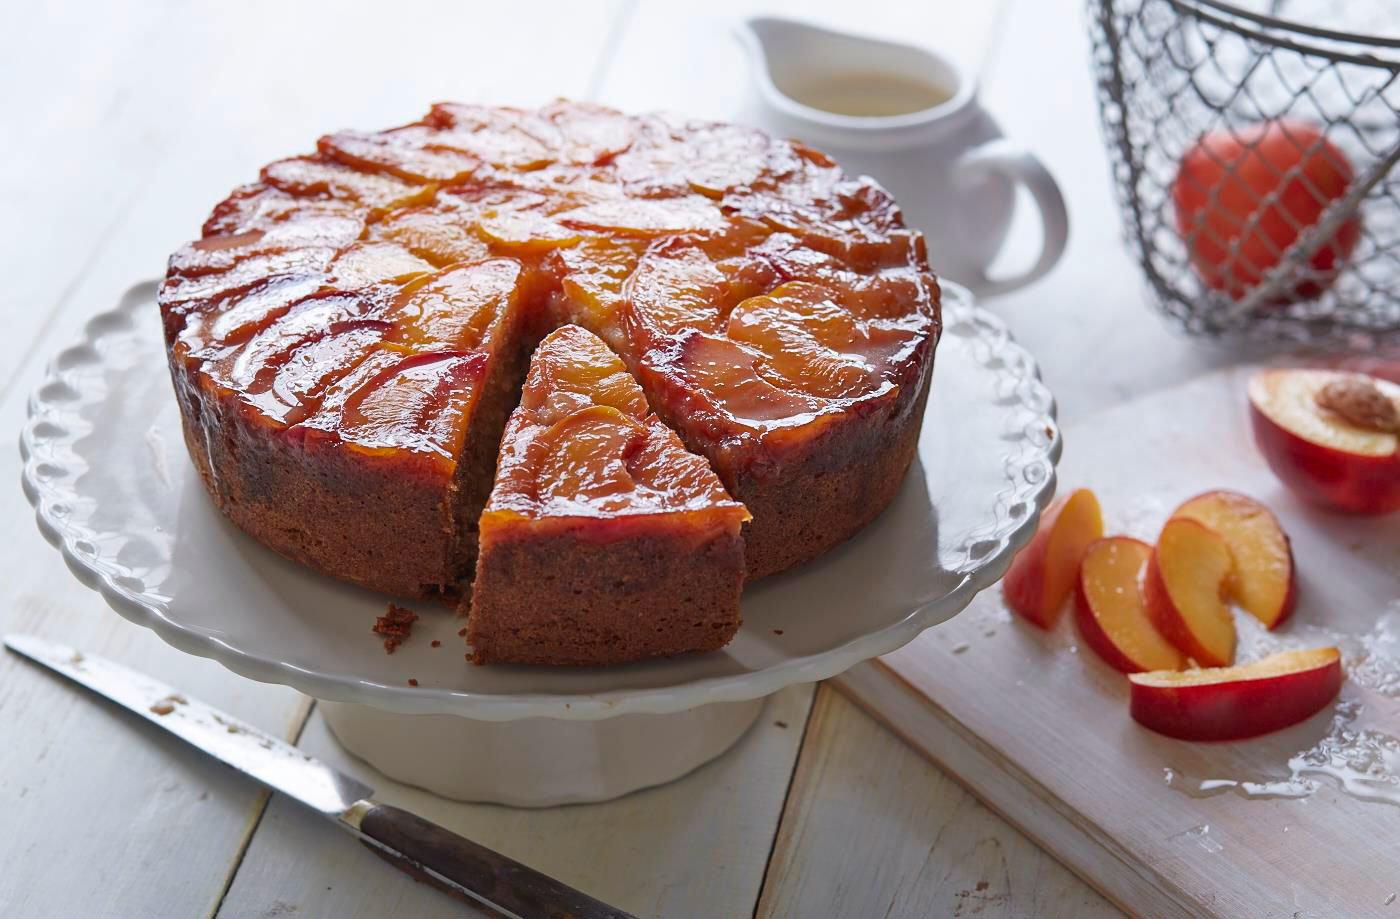 Great Cake Recipes Uk: Nectarine Upside-down Cake